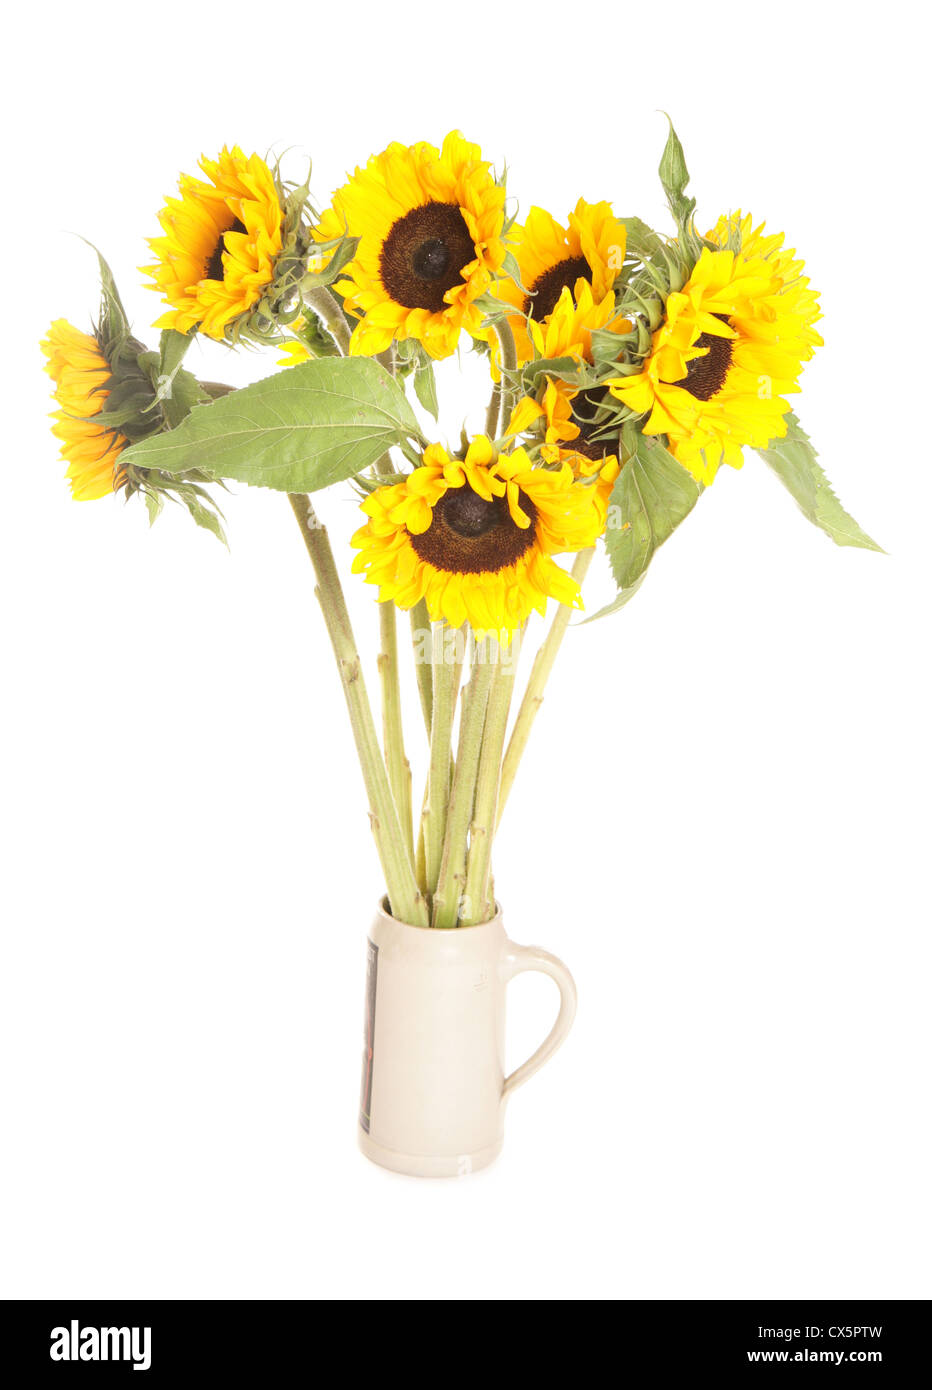 Bunch of sunflowers studio cutout - Stock Image